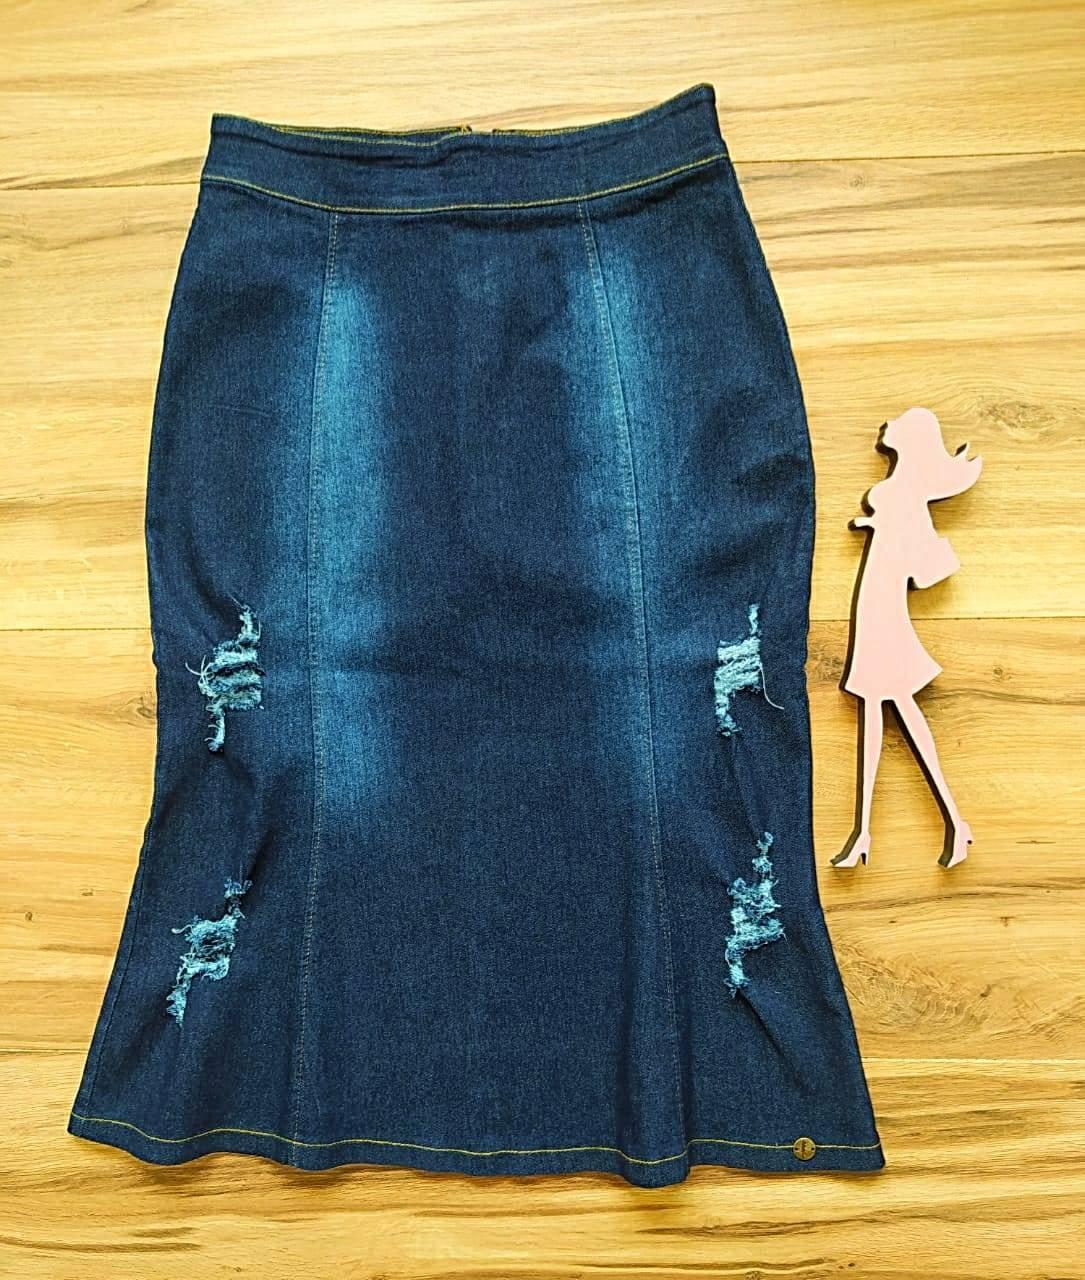 Saia Jeans Miessa Saia Bella SB7743 Azul Escuro